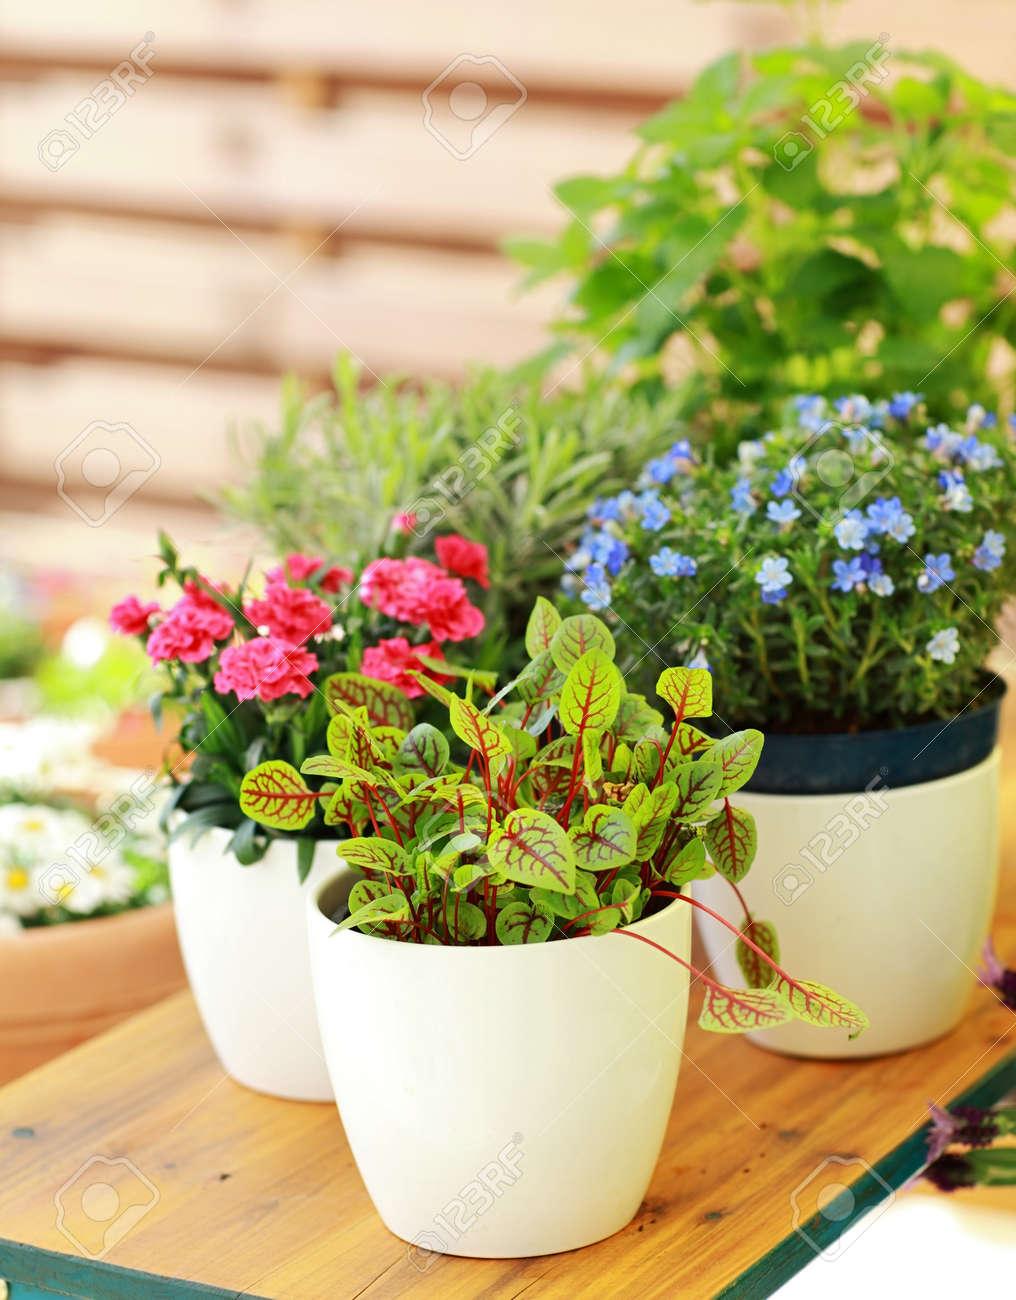 Outdoor flower pots for small garden  patio or terrace Stock Photo    13274359. Outdoor Flower Pots For Small Garden  Patio Or Terrace Stock Photo